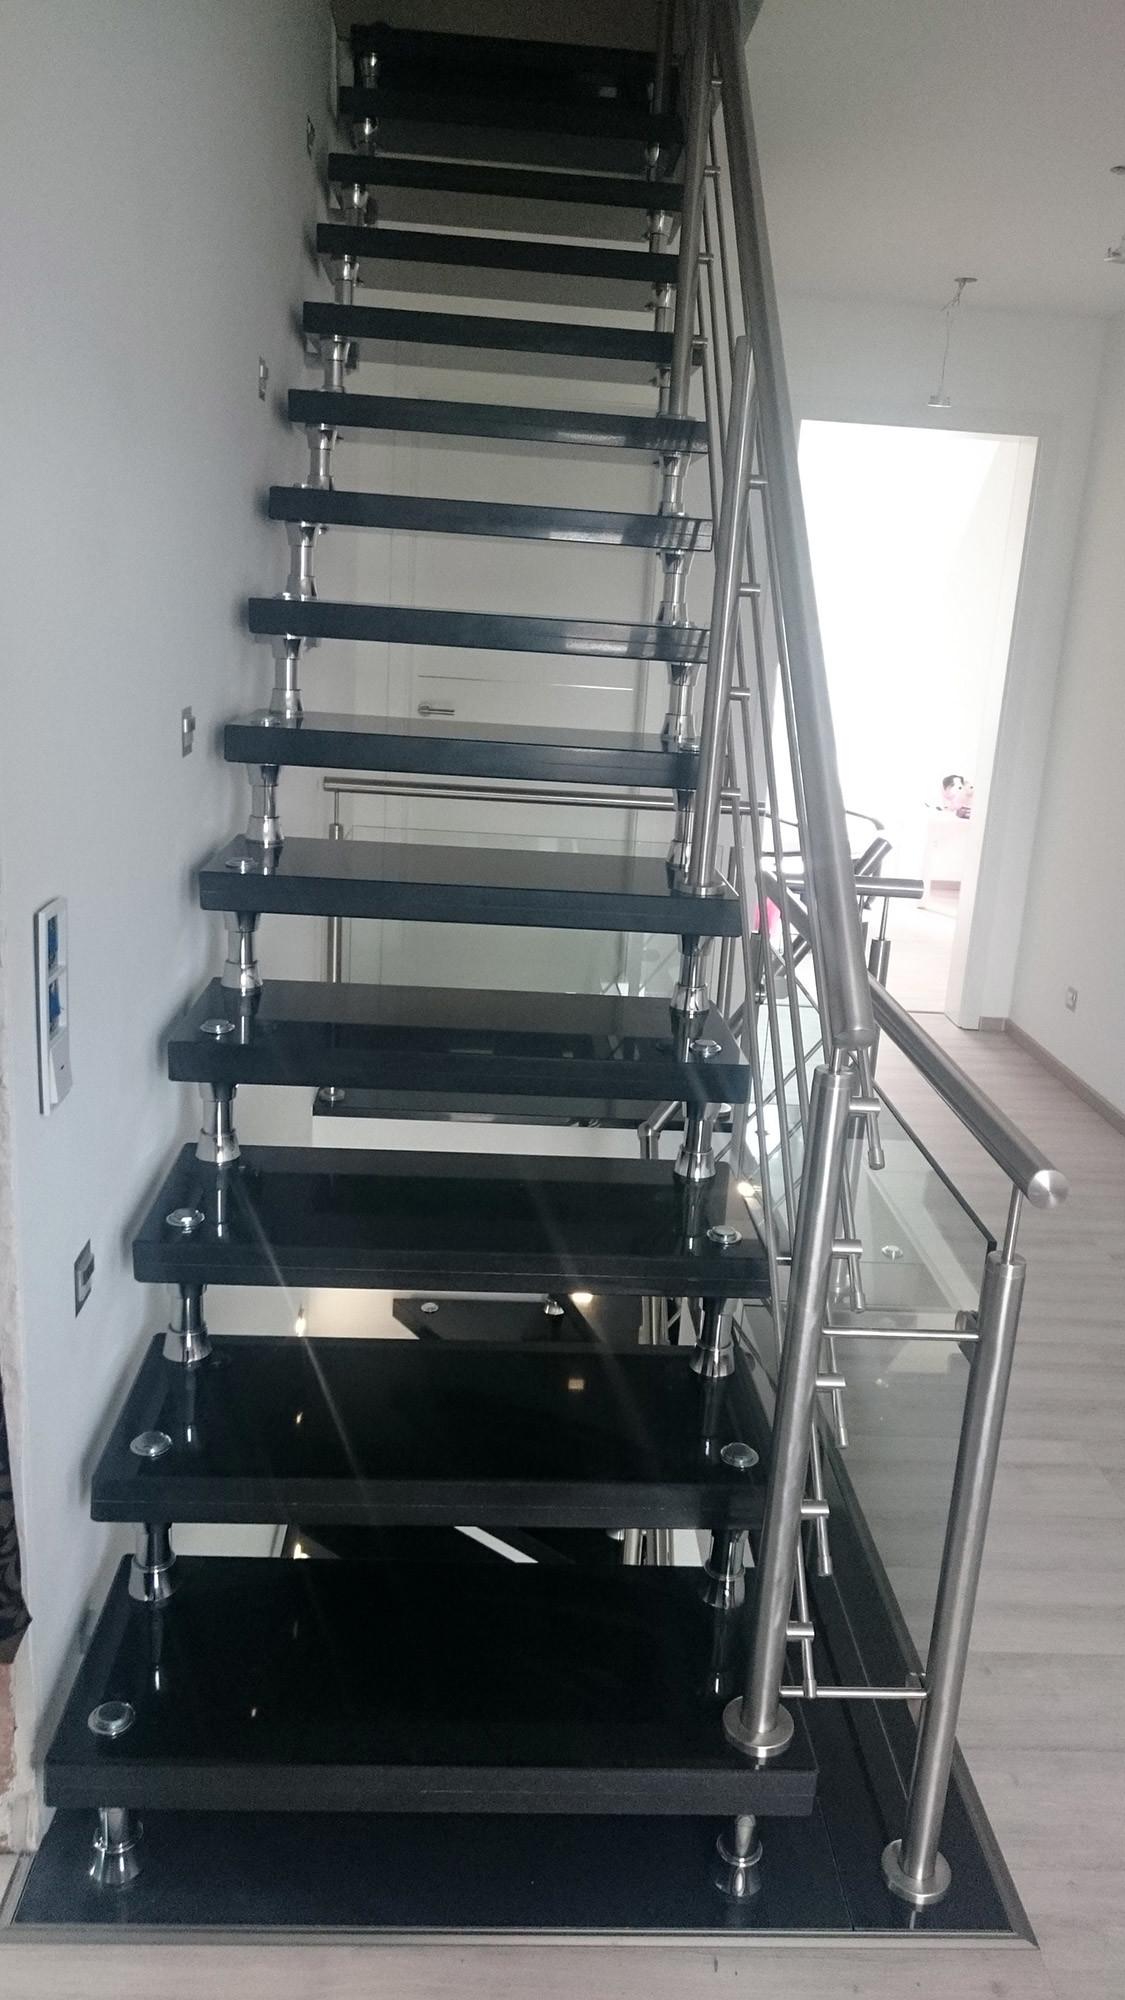 bolzentreppe freitragende treppe aus granit preise einbau. Black Bedroom Furniture Sets. Home Design Ideas